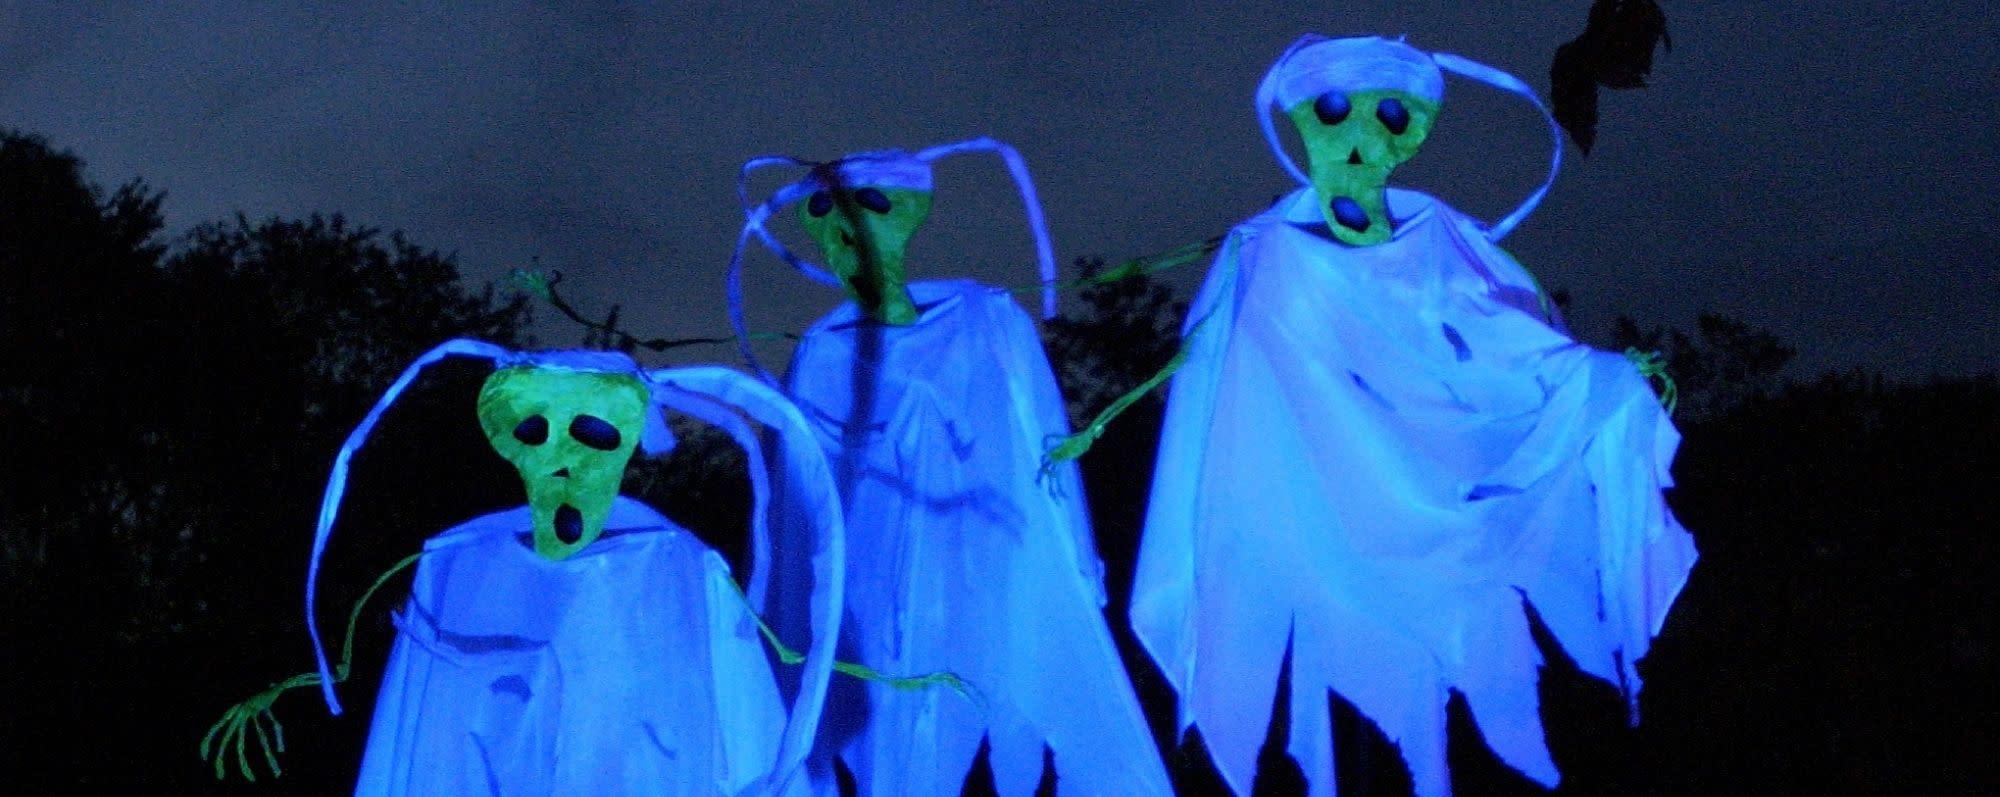 Ghost-like figures